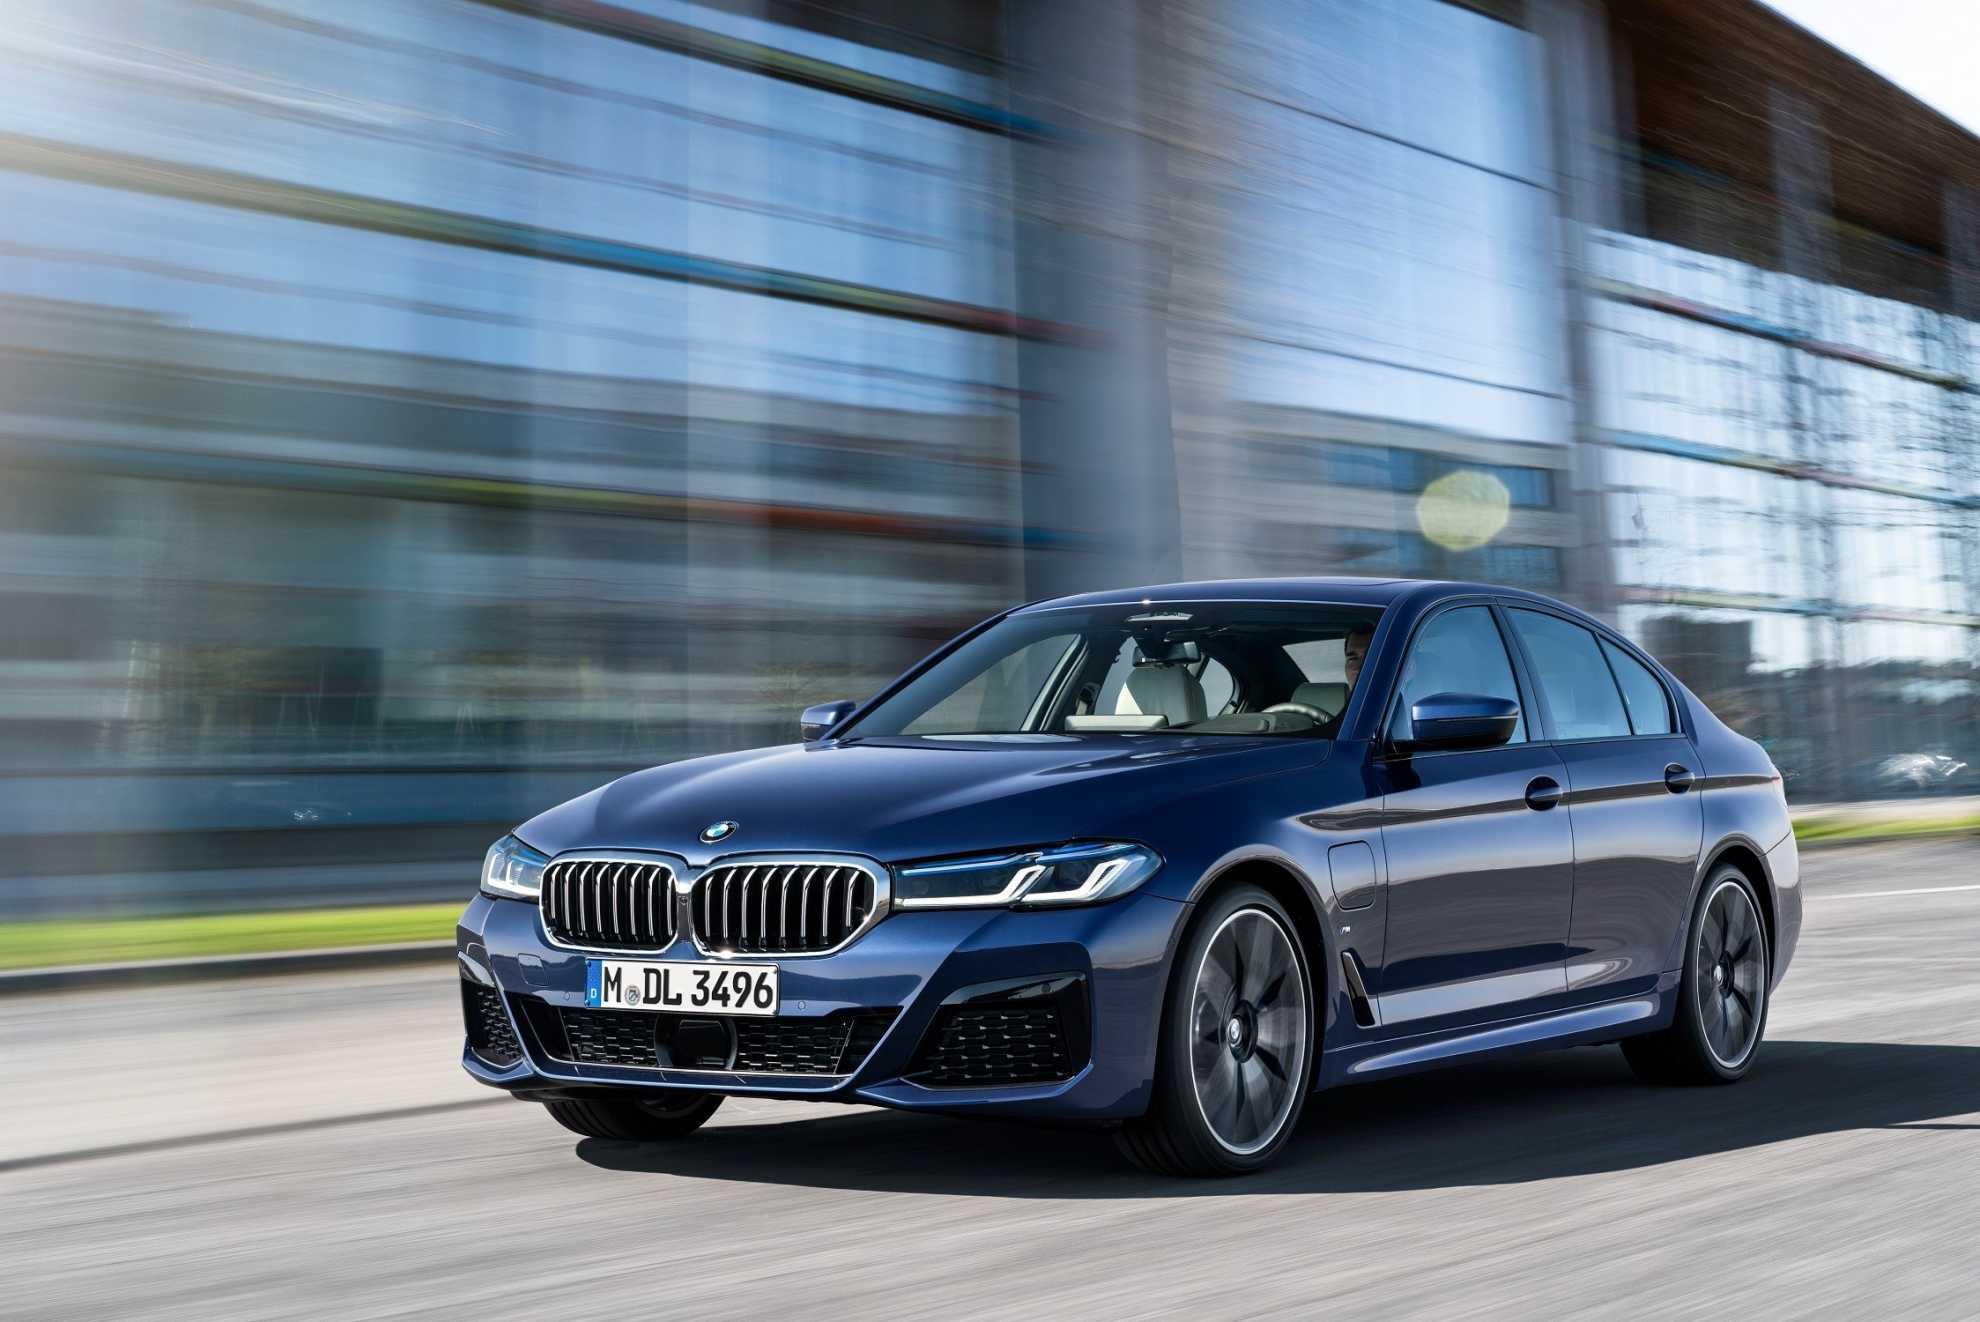 The BMW M5 Edition 35 Jahre Door Sill